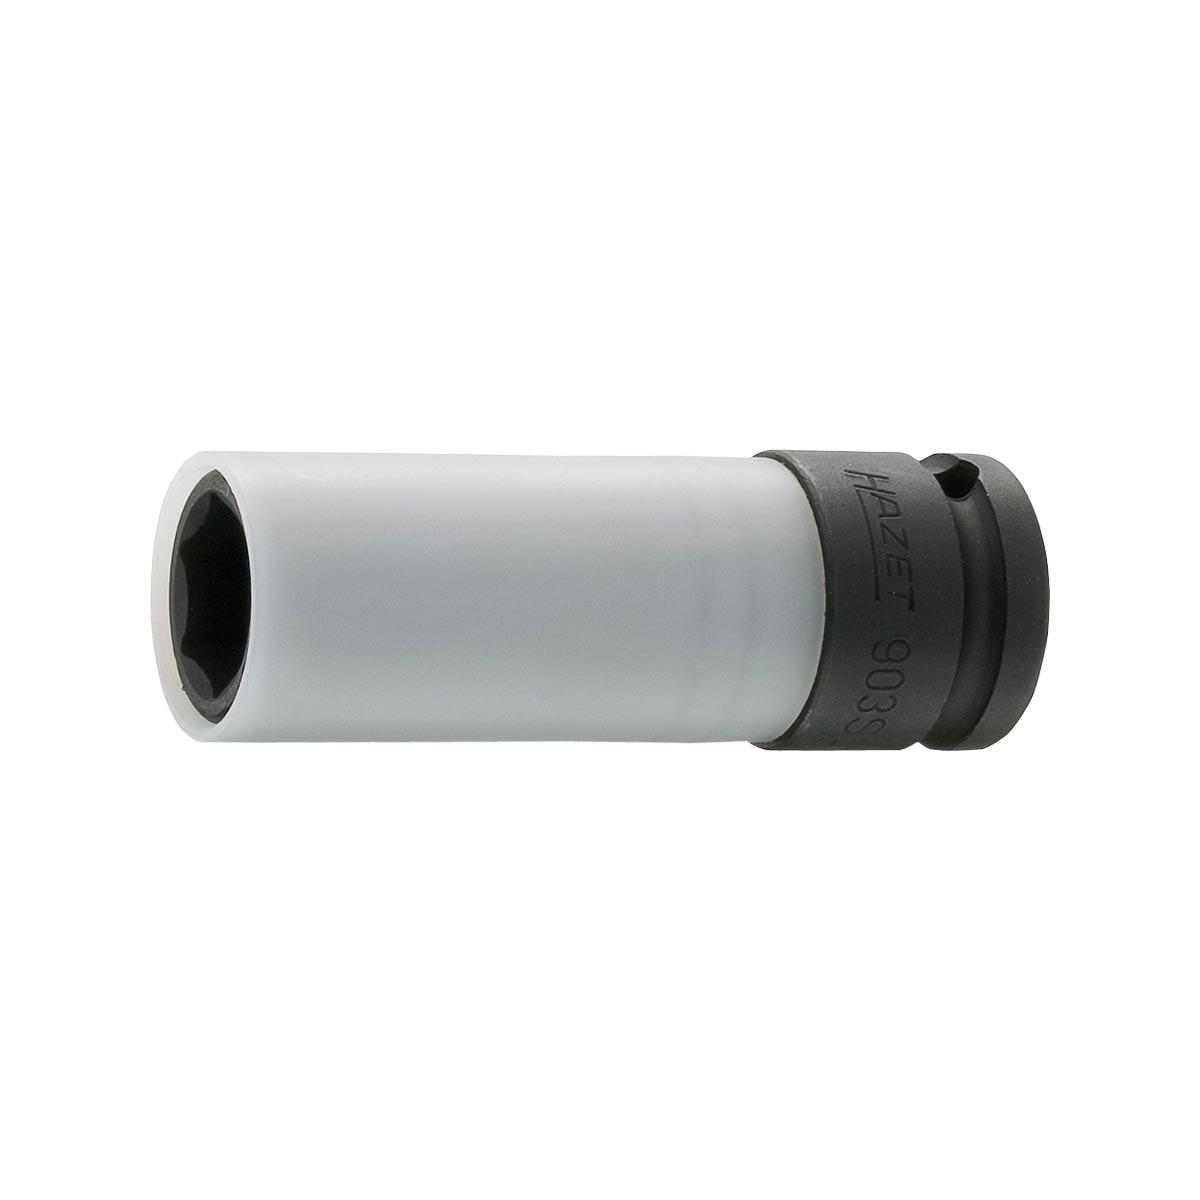 HAZET 903SLg-15 Impact 6point socket, size 15 mm